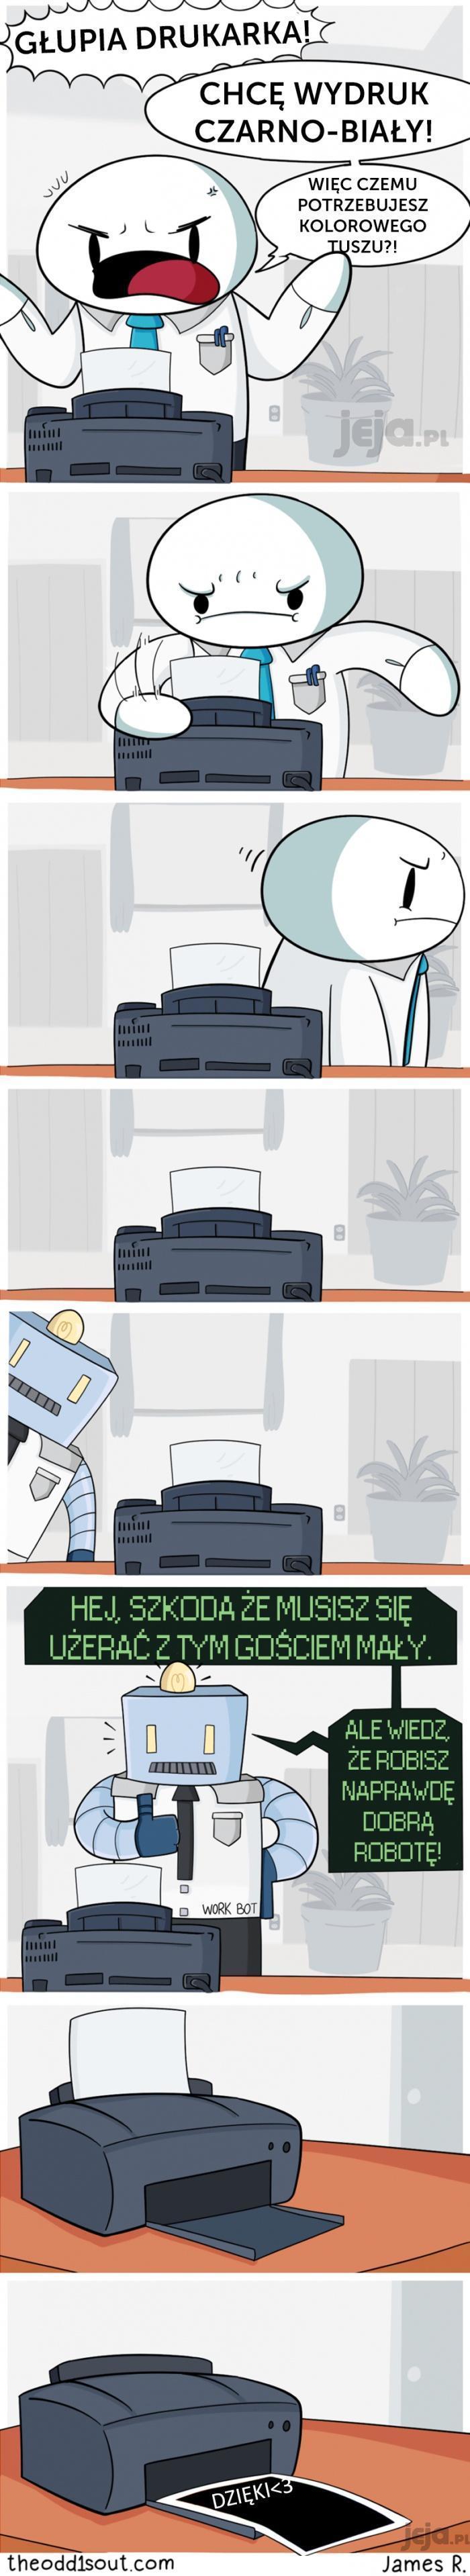 Głupie drukarki też maja uczucia